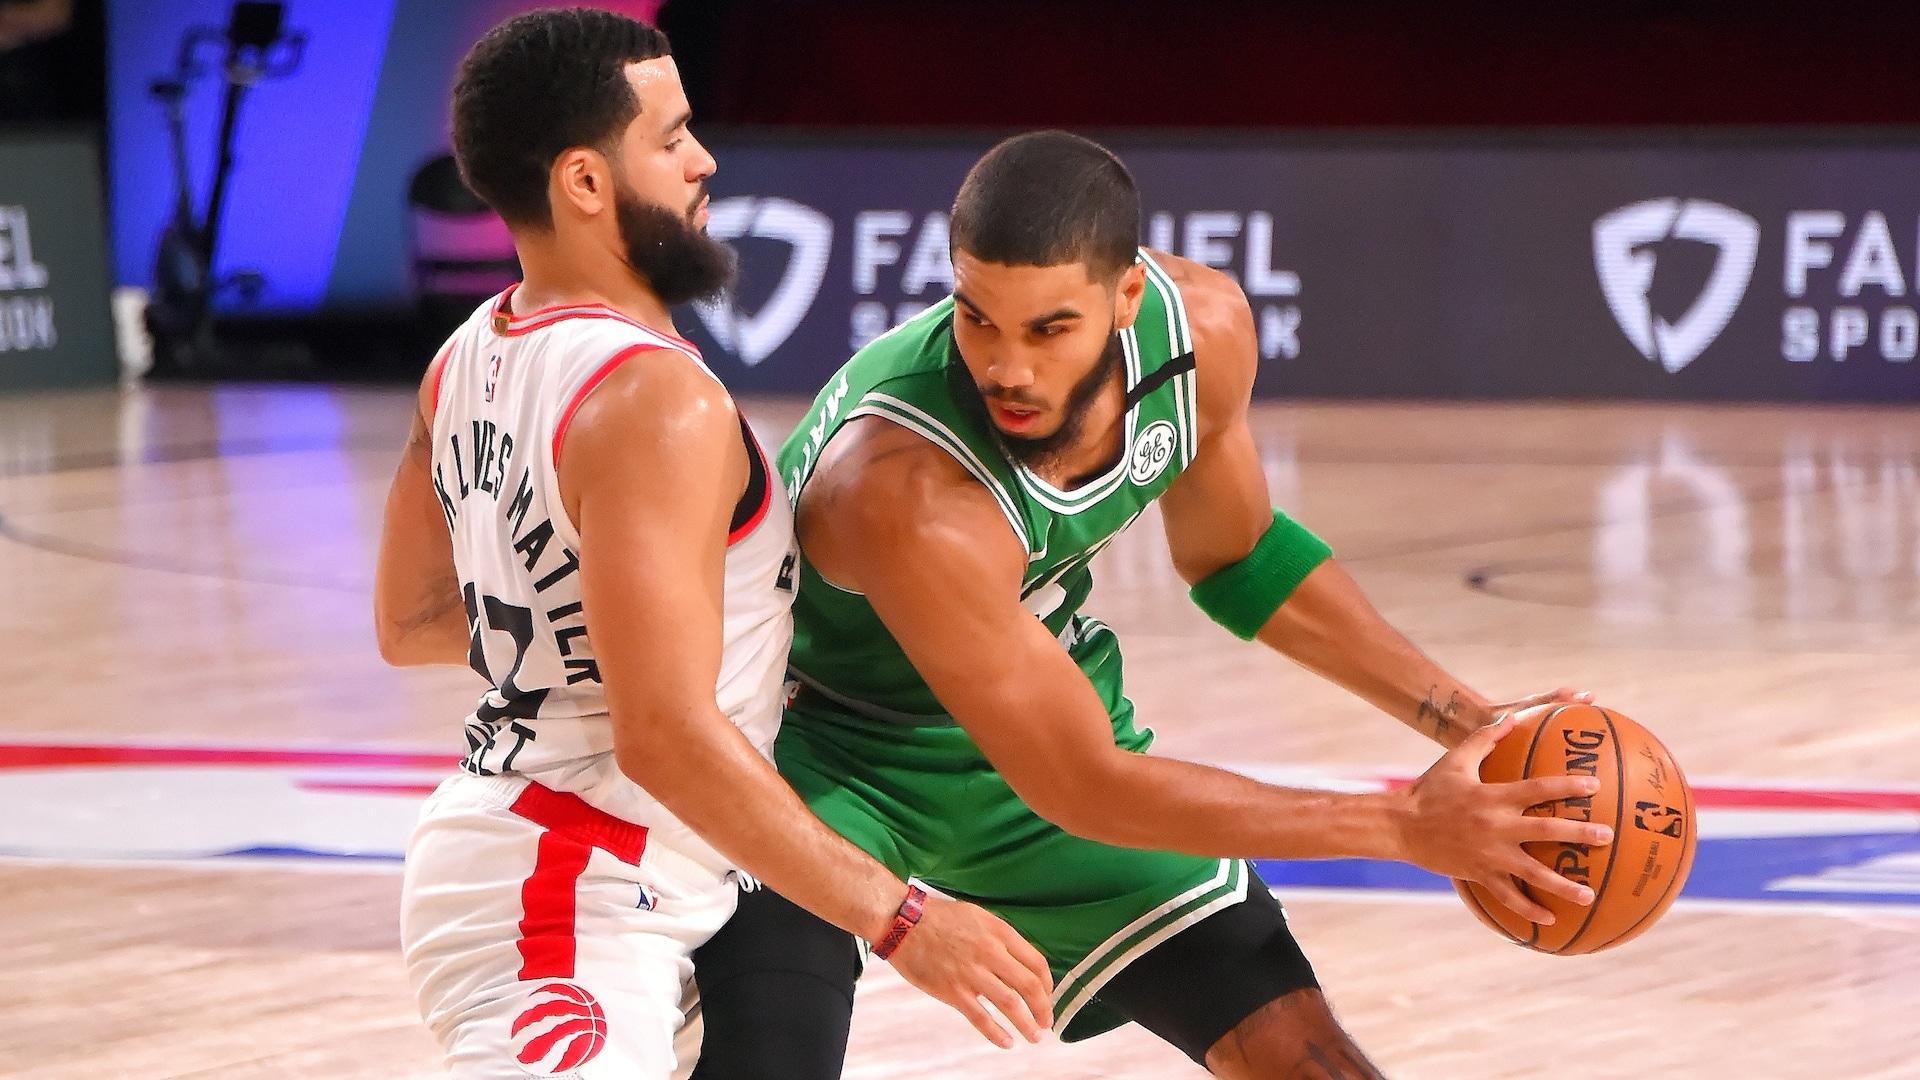 Numbers preview: Toronto Raptors (2) vs. Boston Celtics (3)